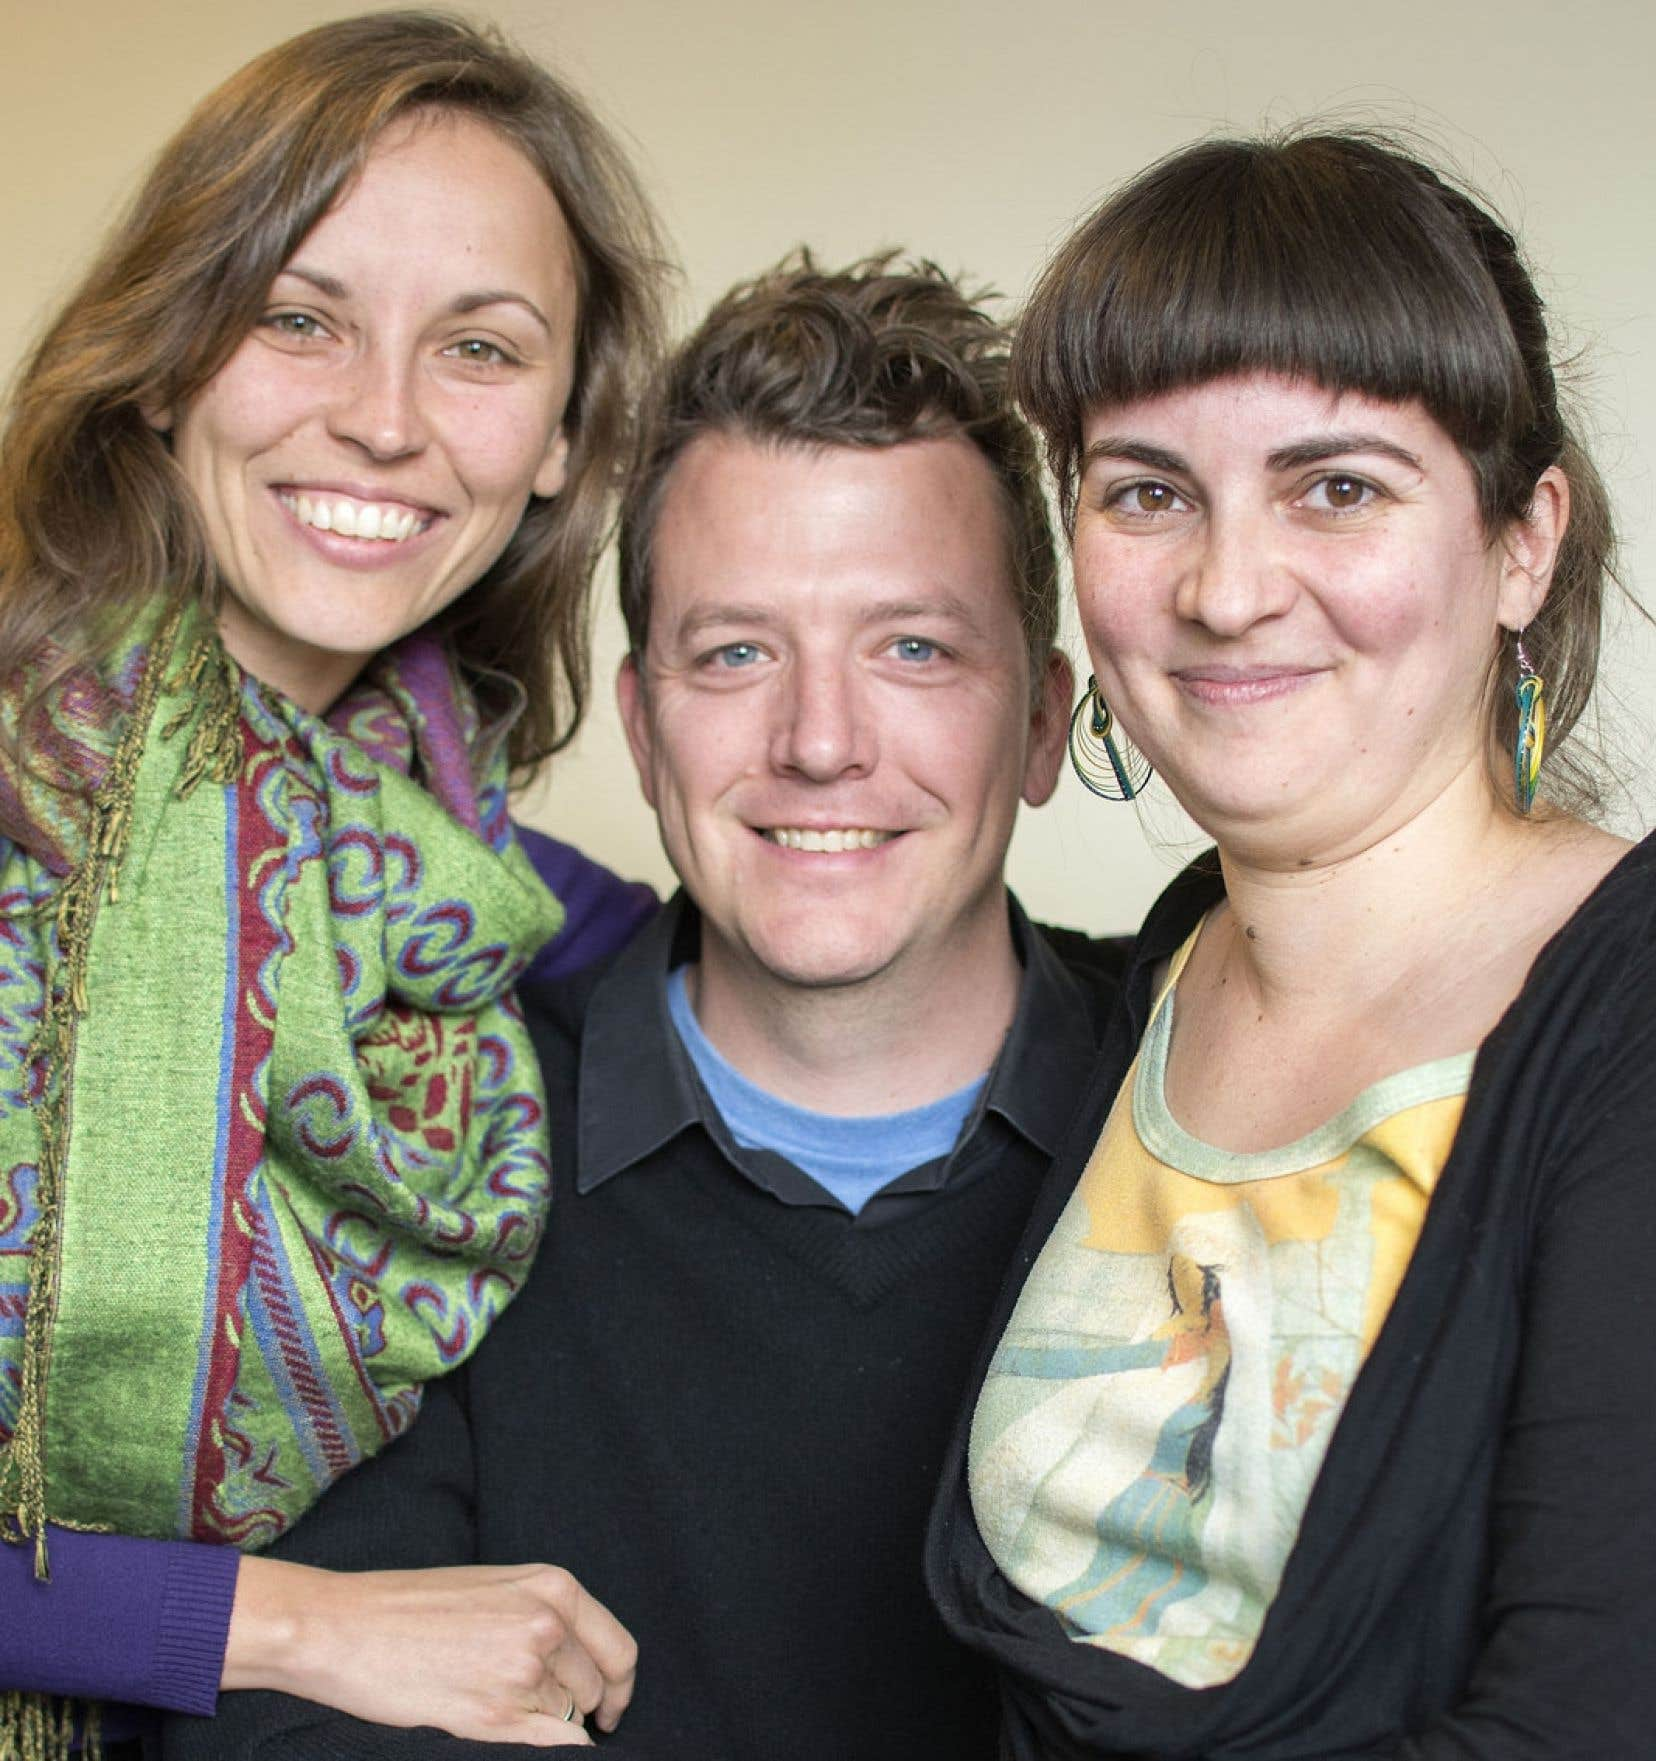 Svetla Turnin, Ezra Winton et Inês Lopes sont au cœur de Cinema Politica.